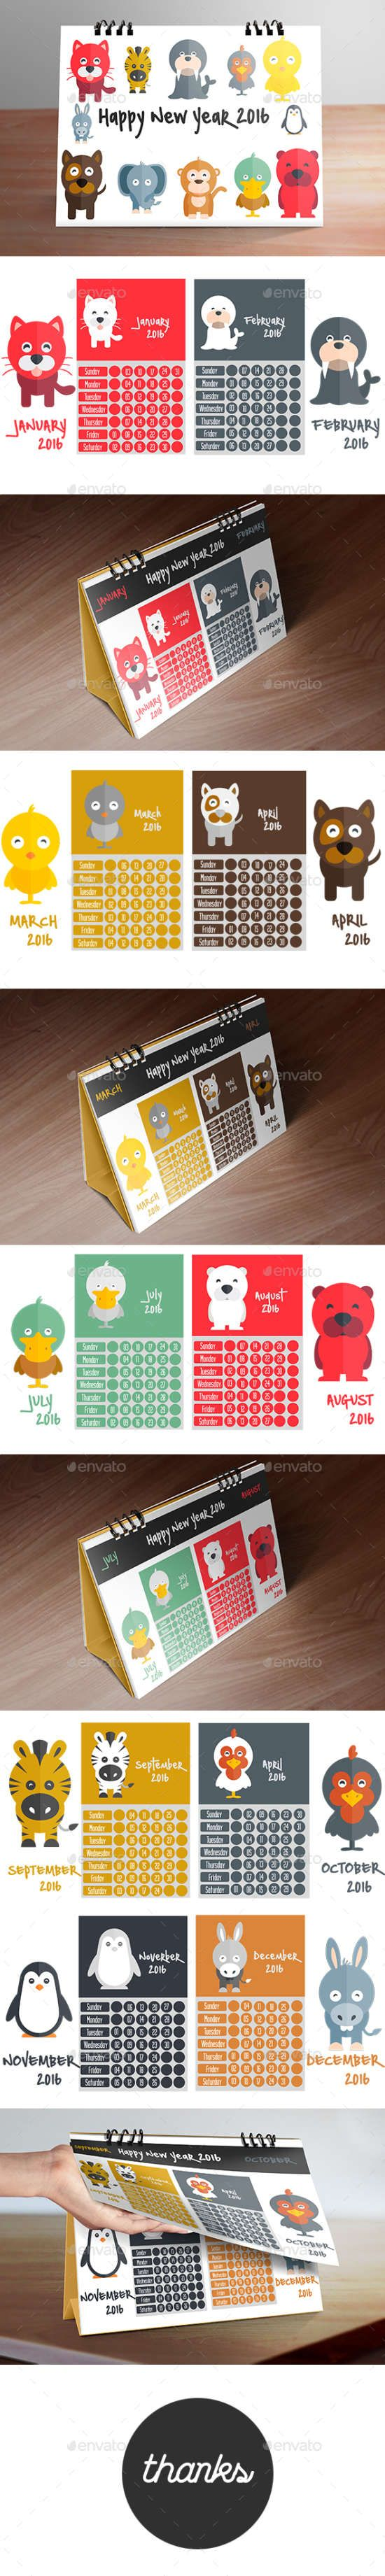 calendar 2016 (kid desk calendar designing)